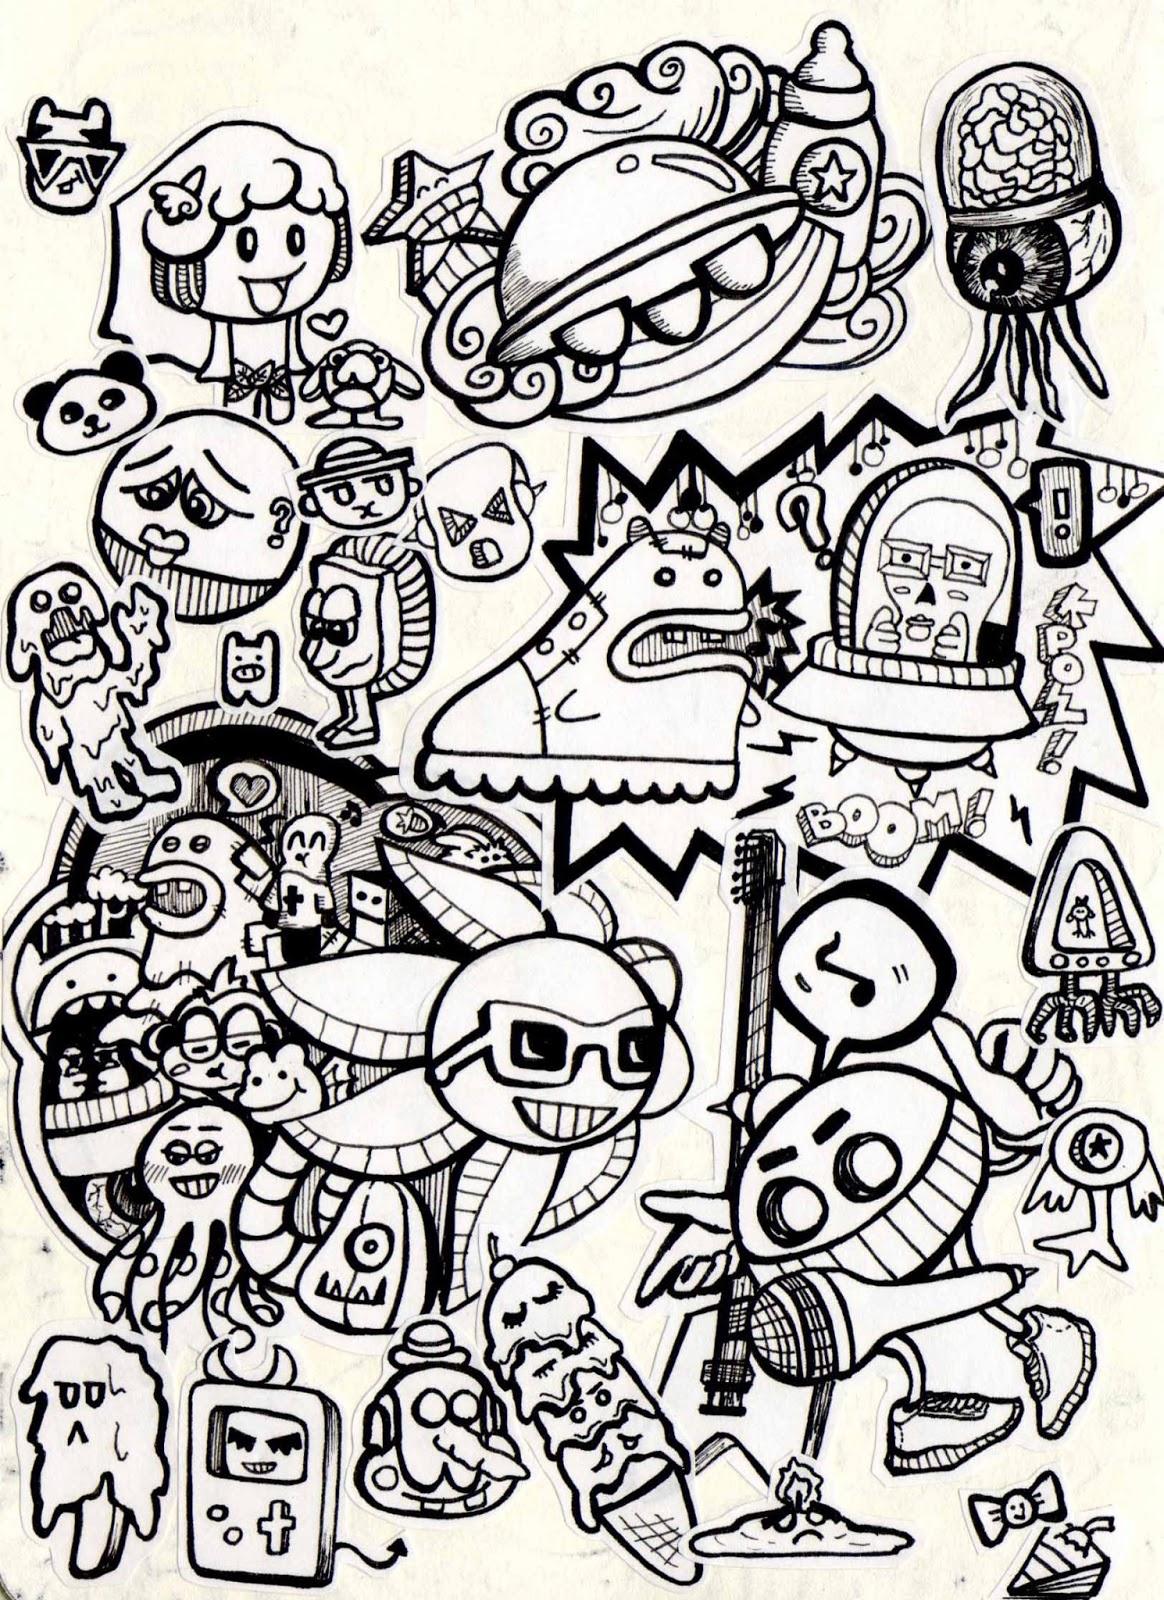 Doodle Art Designs Simple doodle art jobspapaSimple Doodle Art Designs